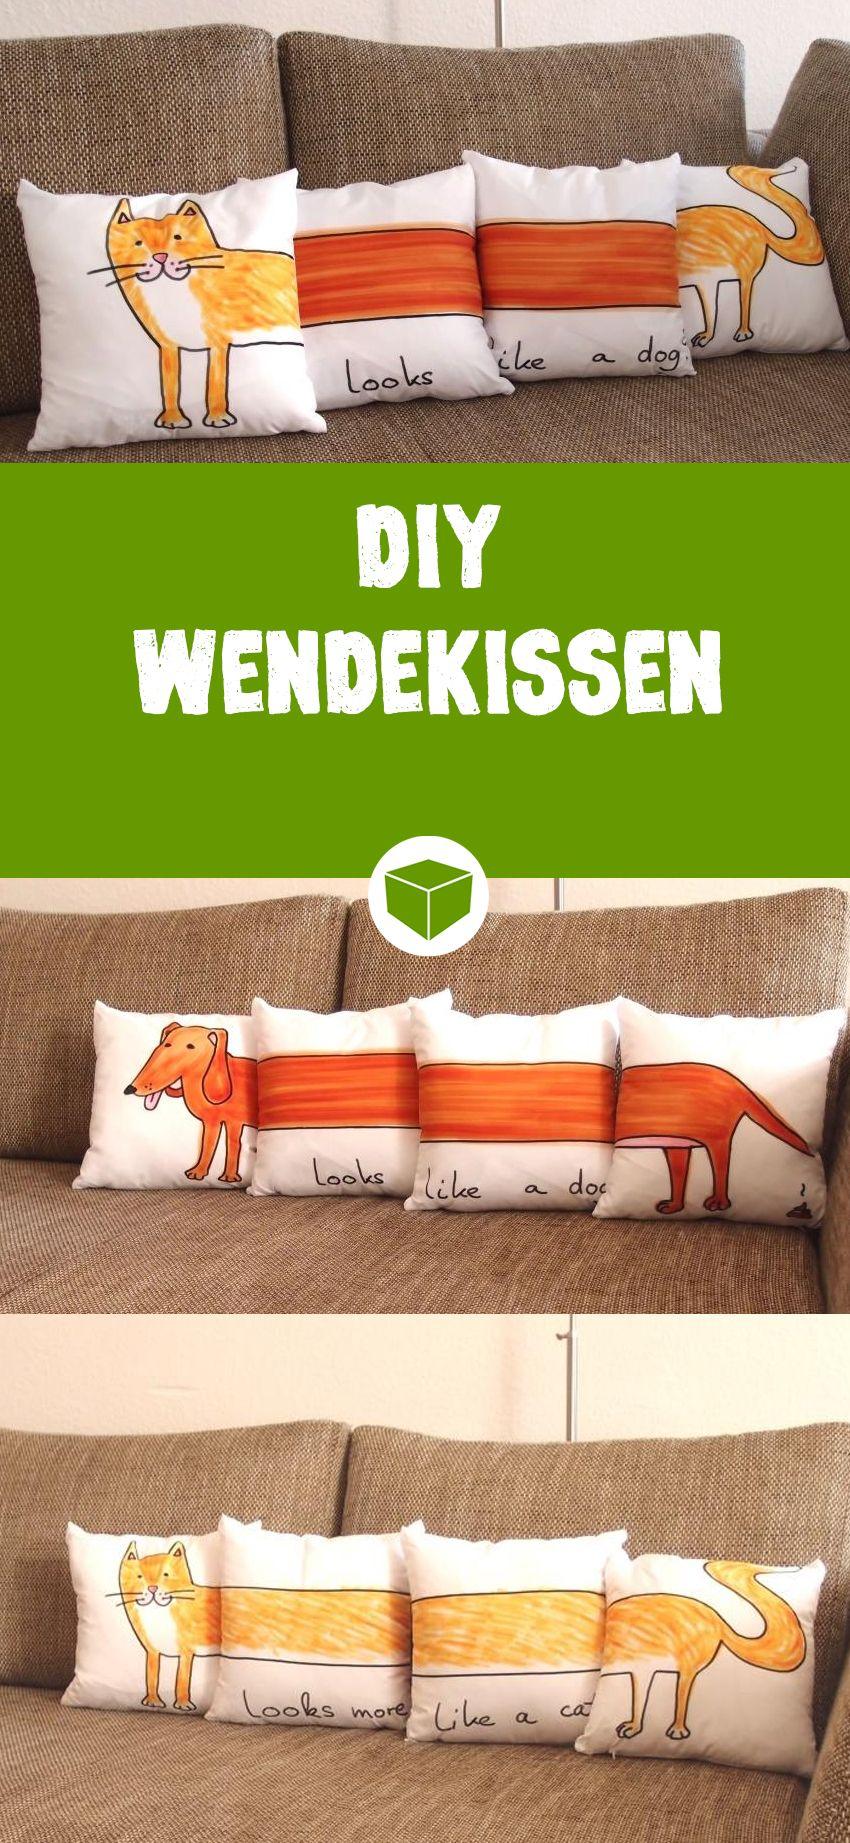 Kreative wohnideen fotokissen in vier teilen  house  pinterest  sewing diy and cushions